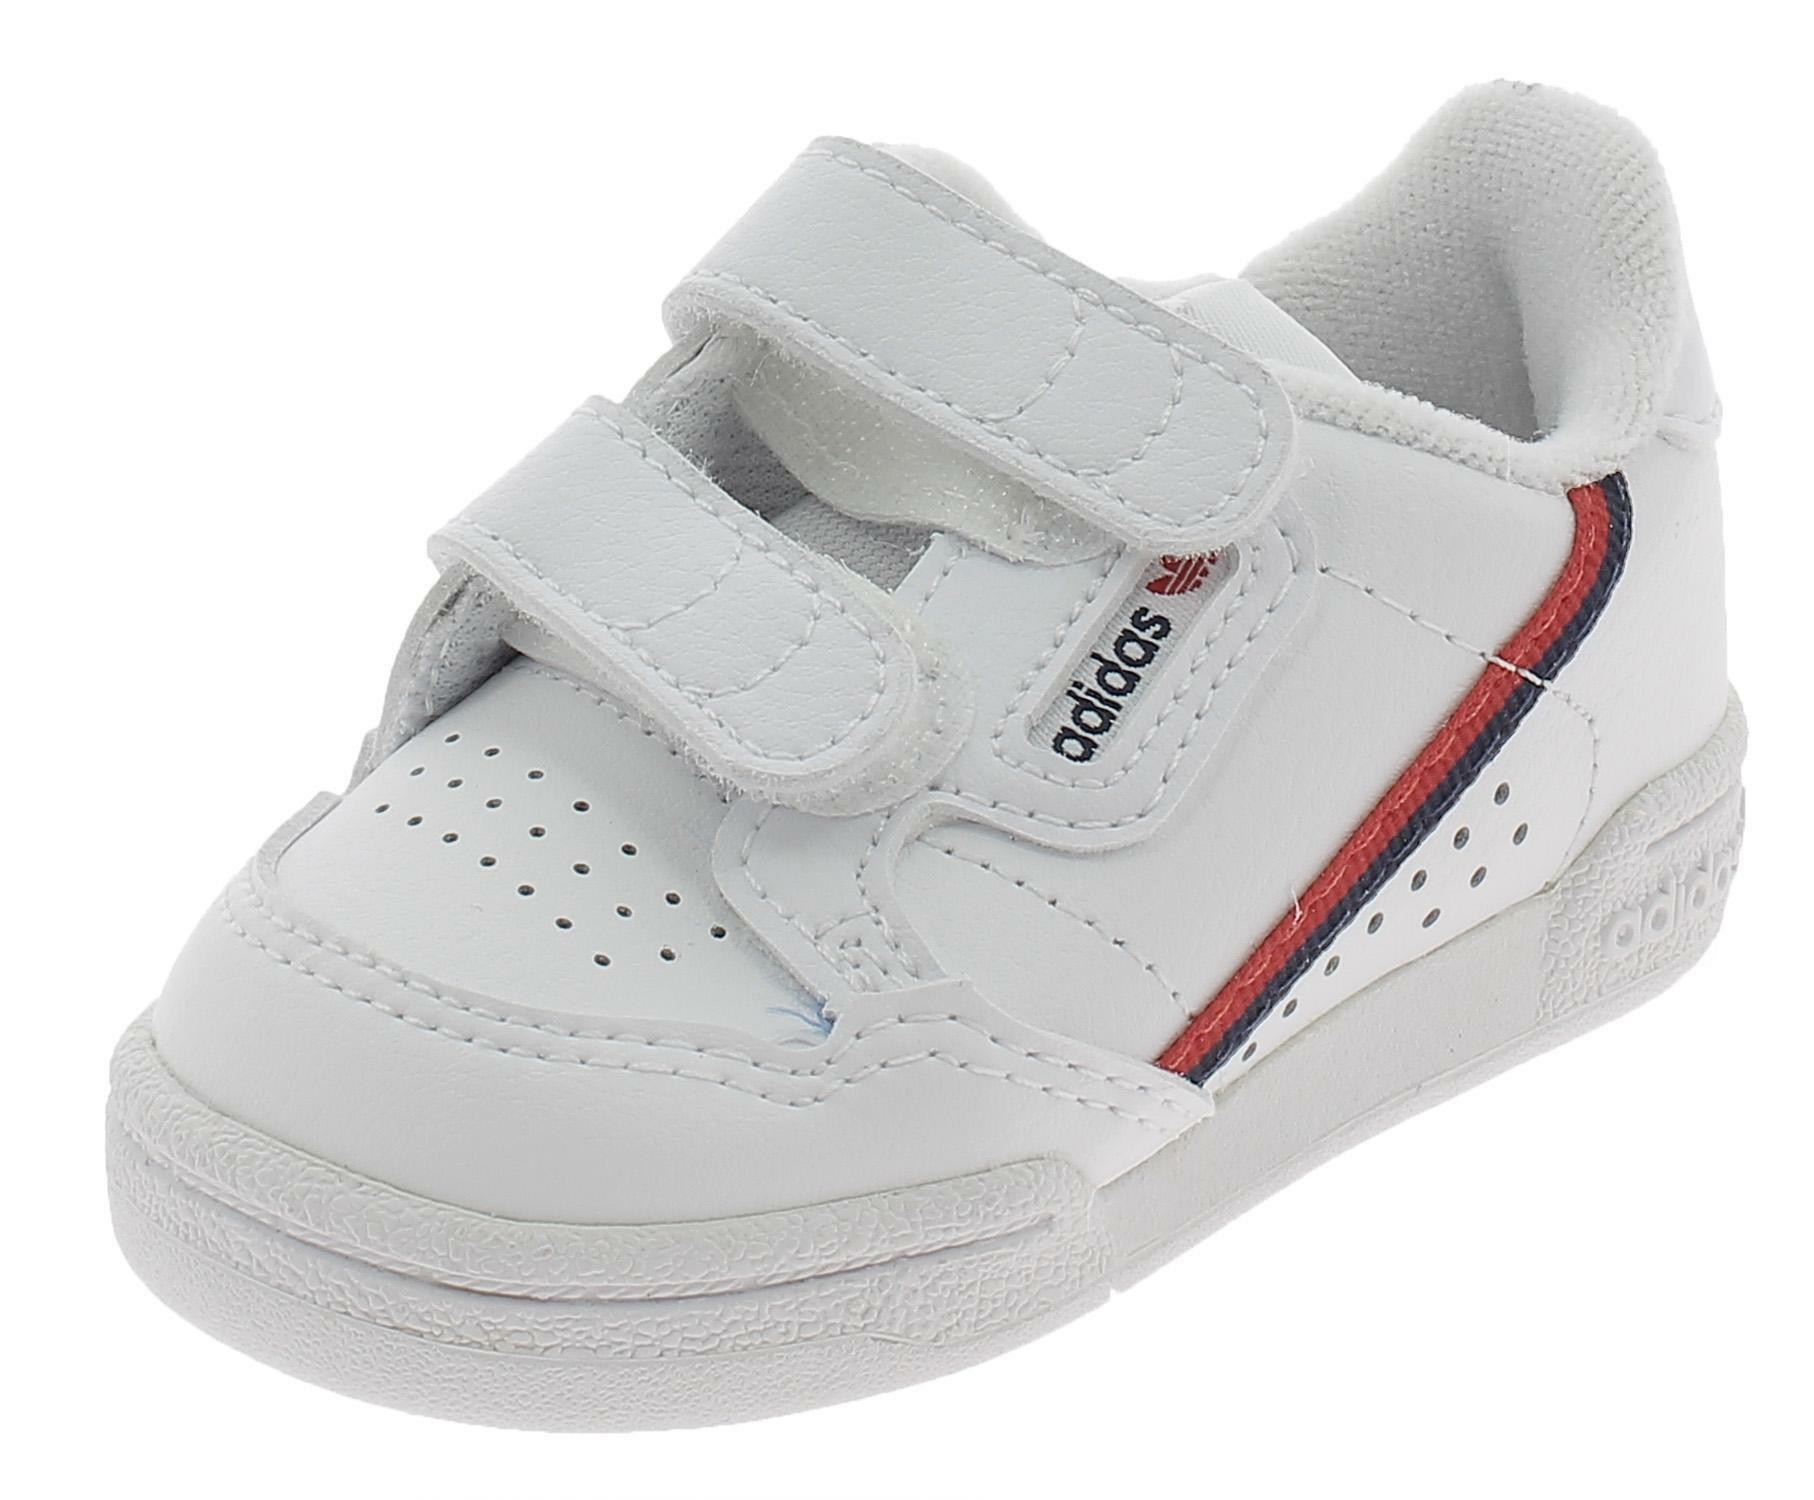 adidas scarpe bianche bambino